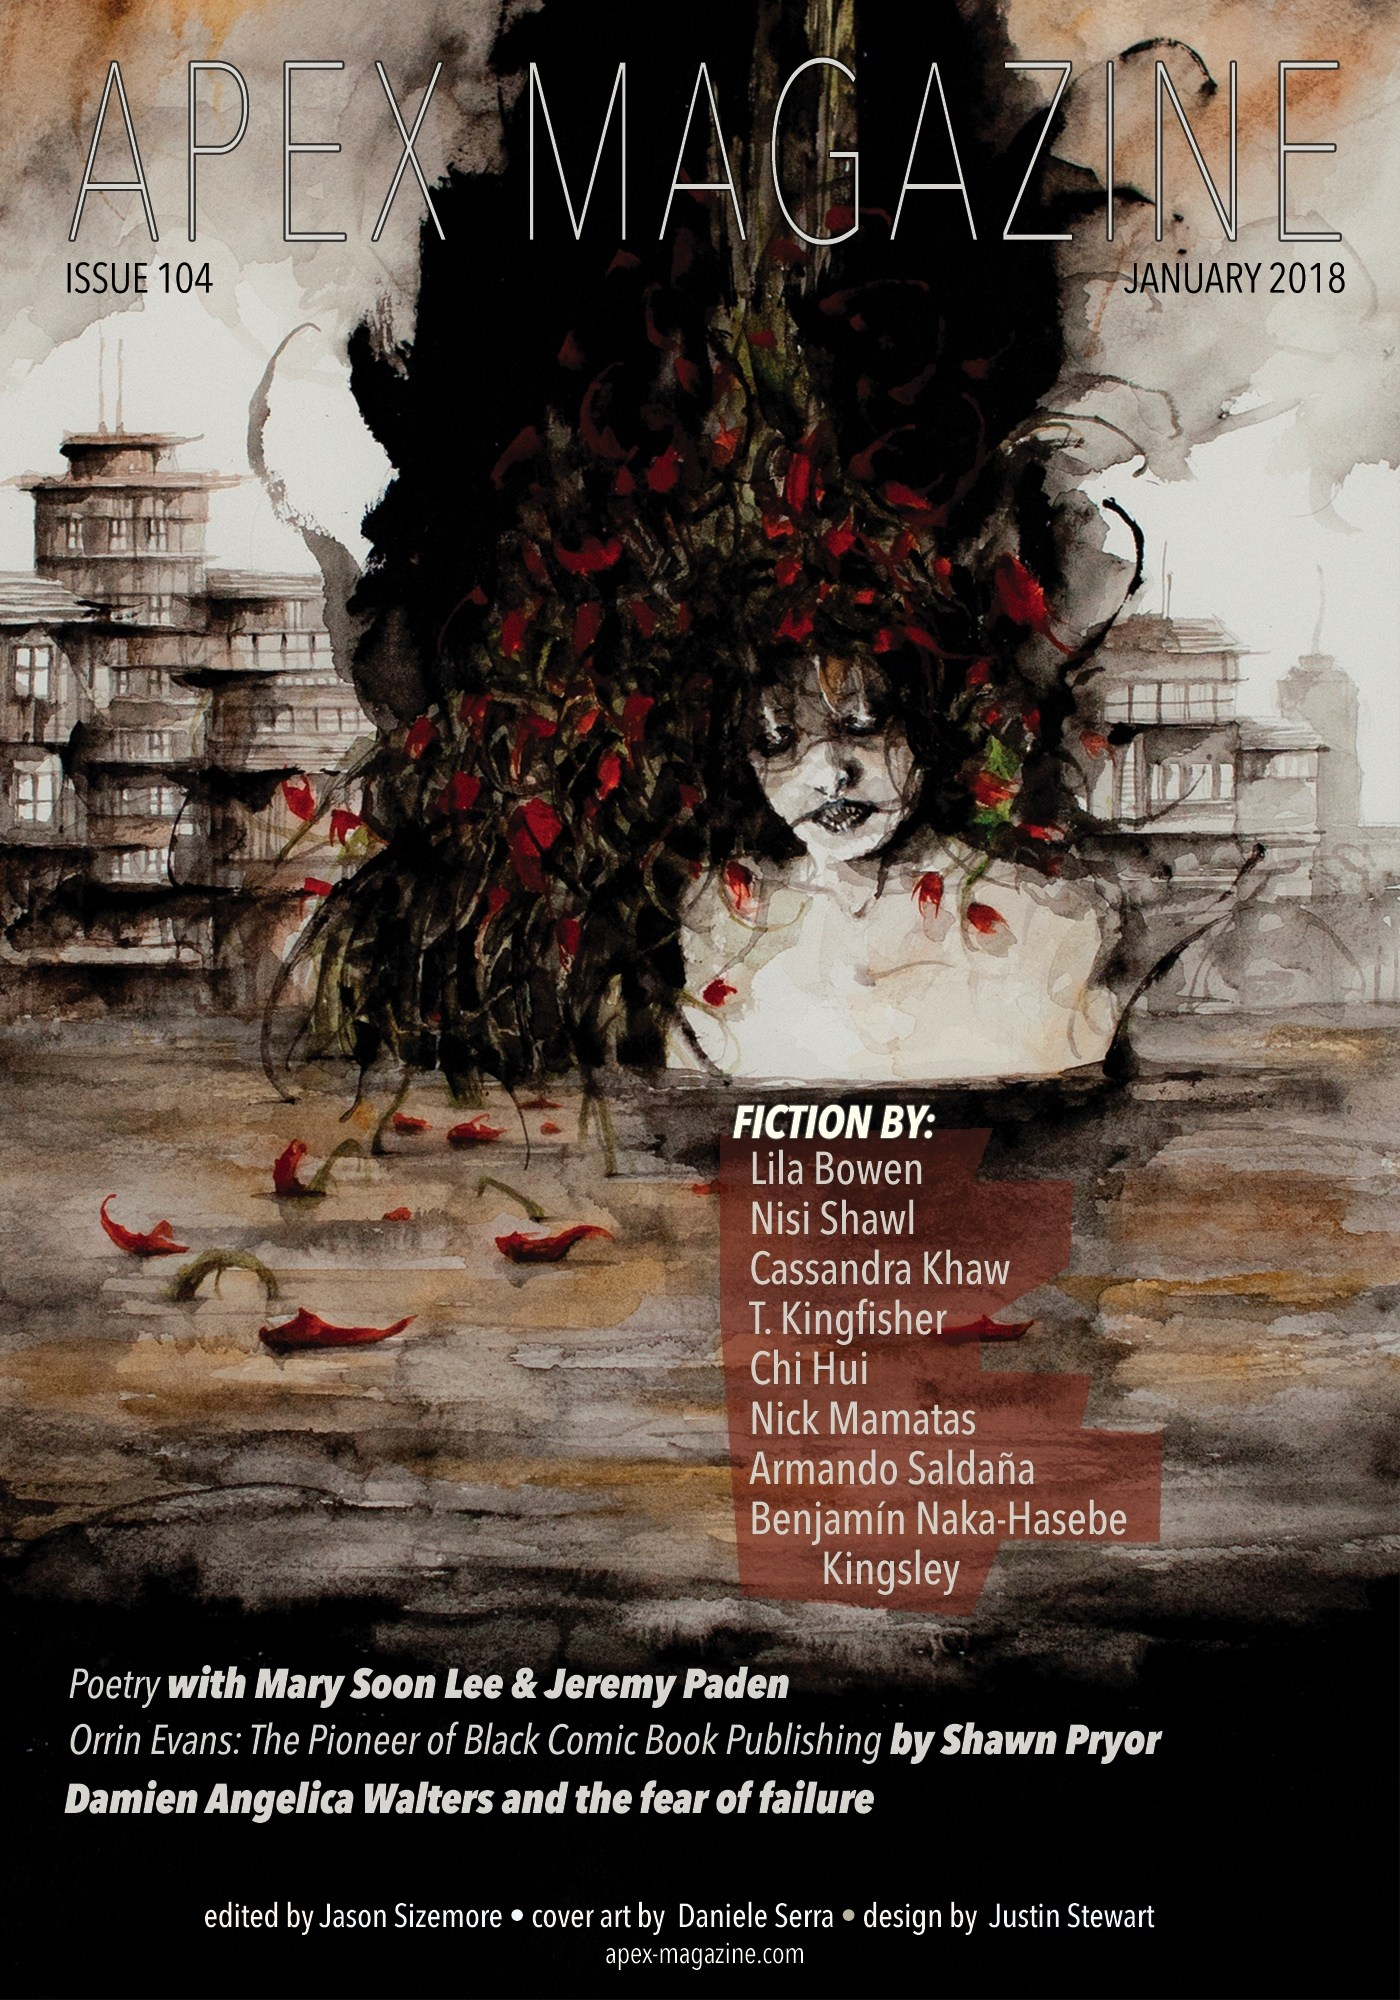 cover art by Daniele Serra https://www.apex-magazine.com/issue-104-january-2018/